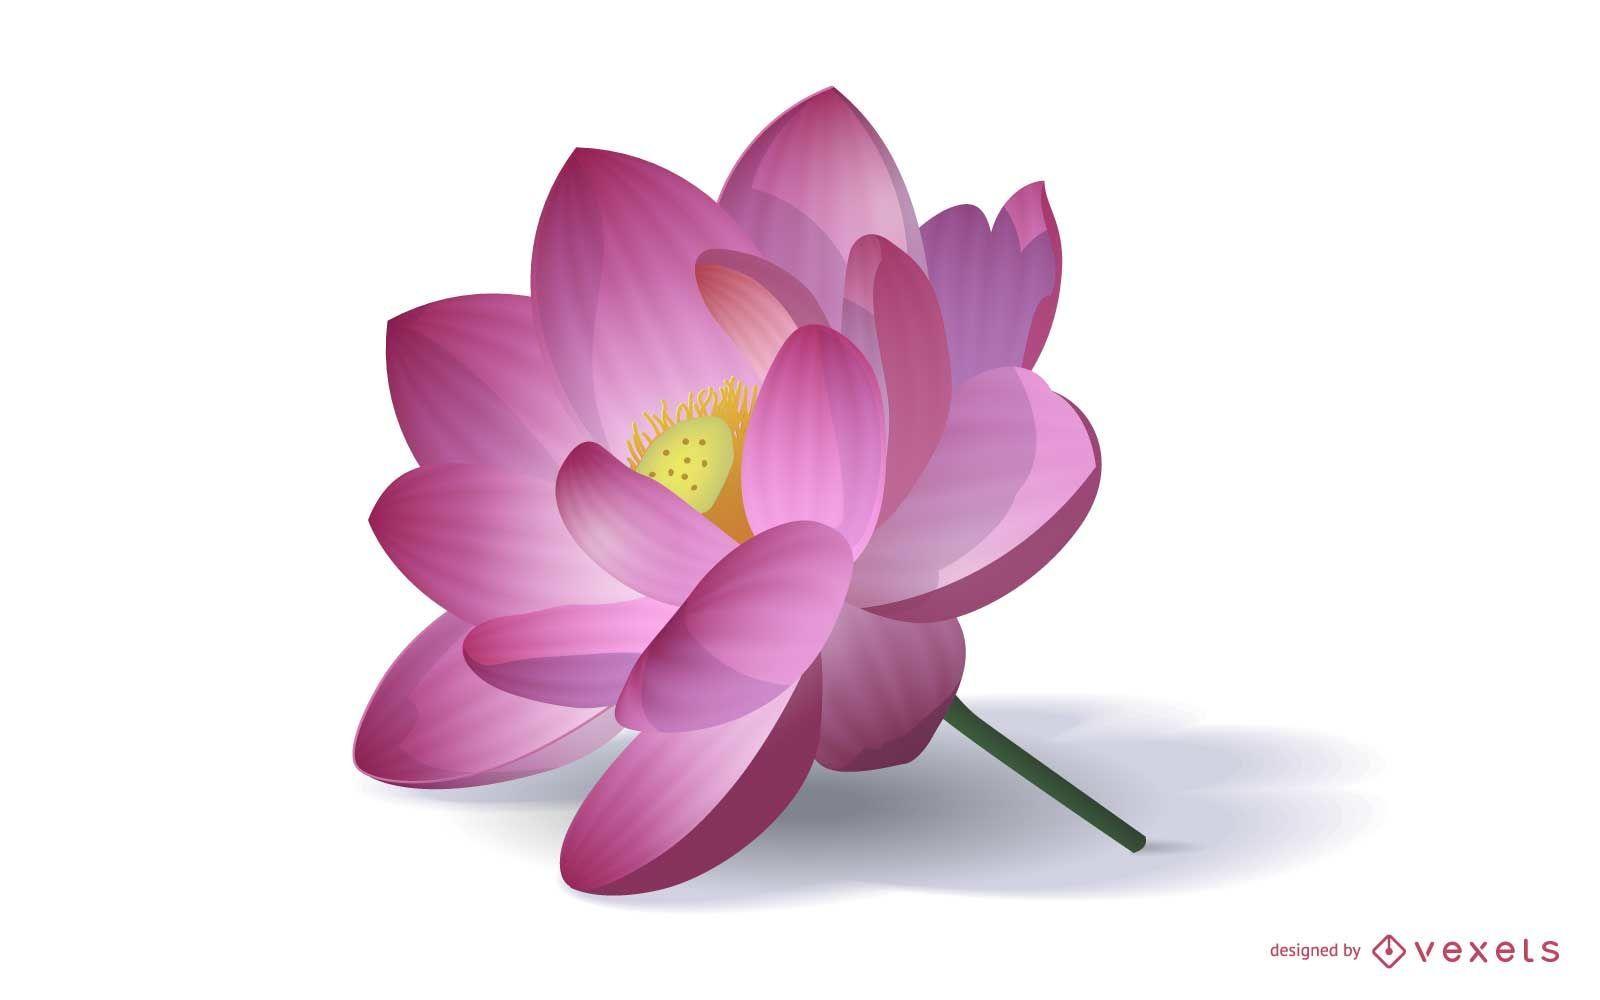 Realistic Lotus Flower Illustration Vector Download